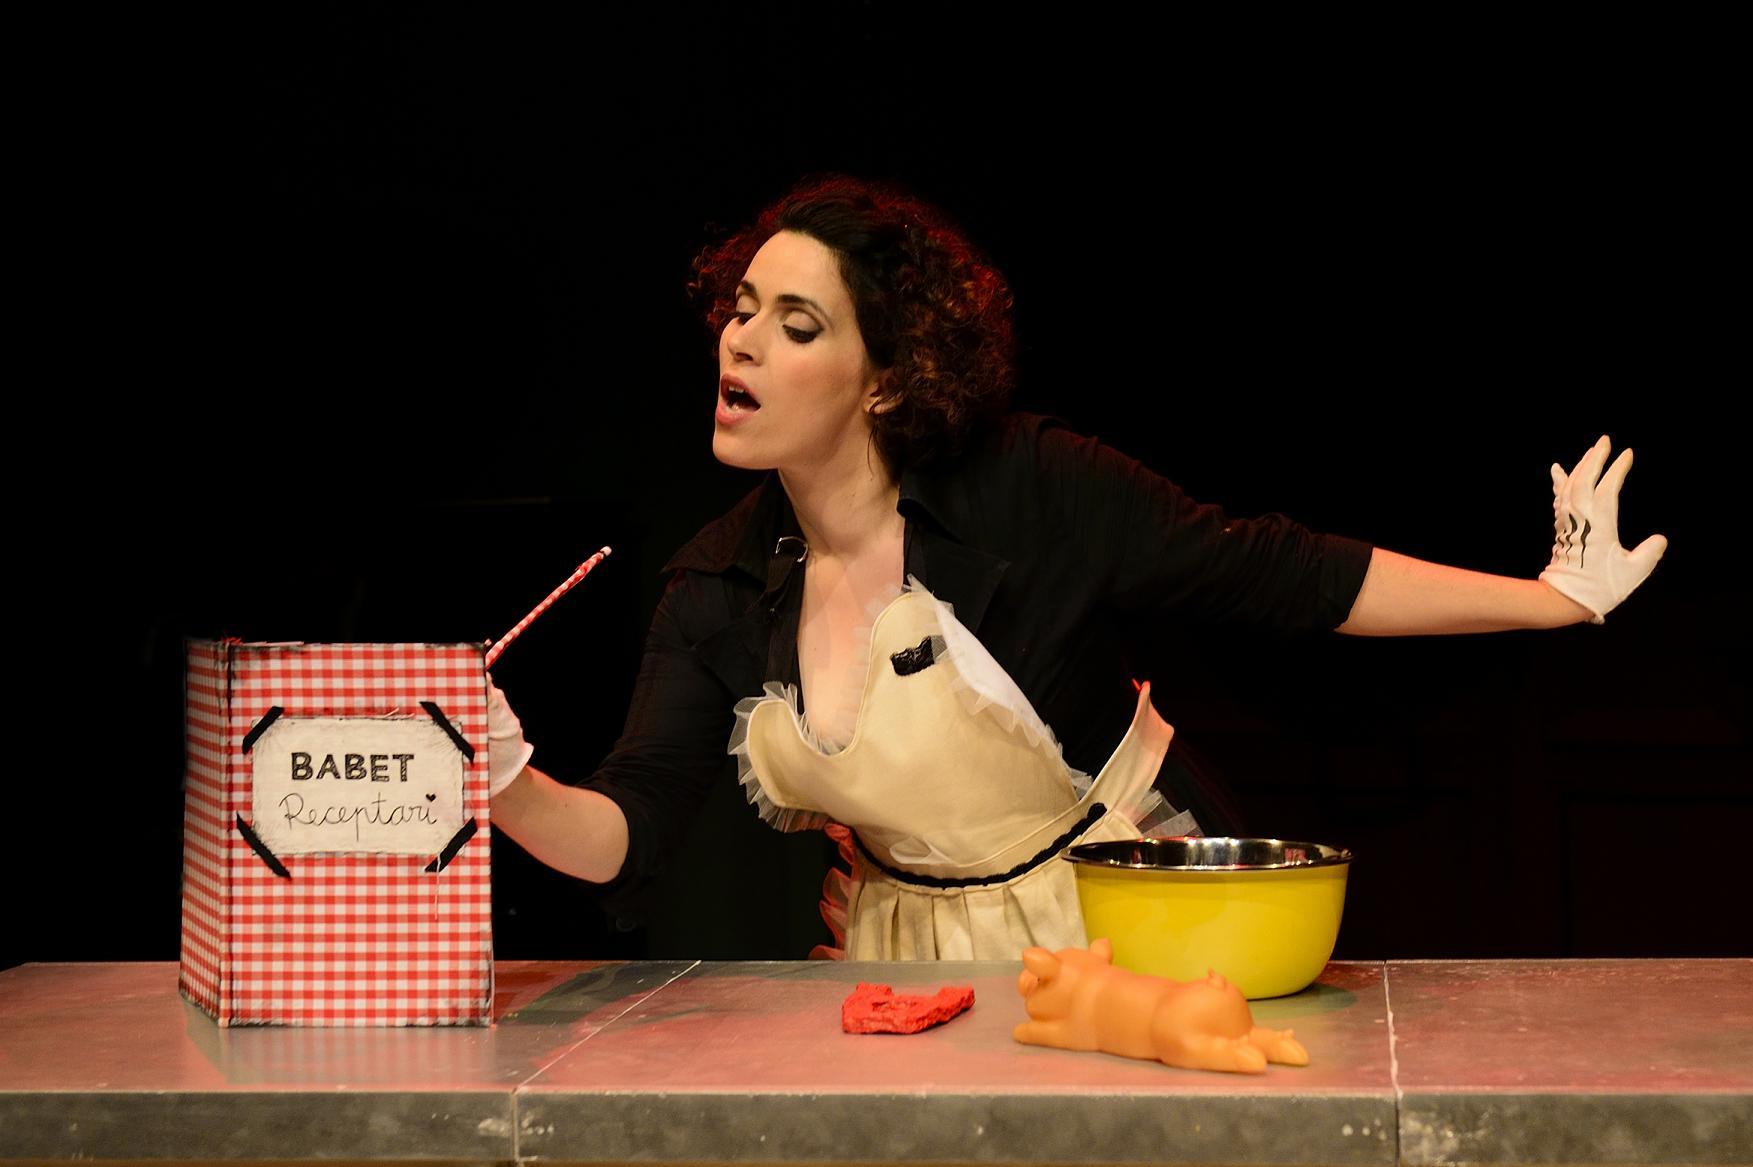 Babet-musical